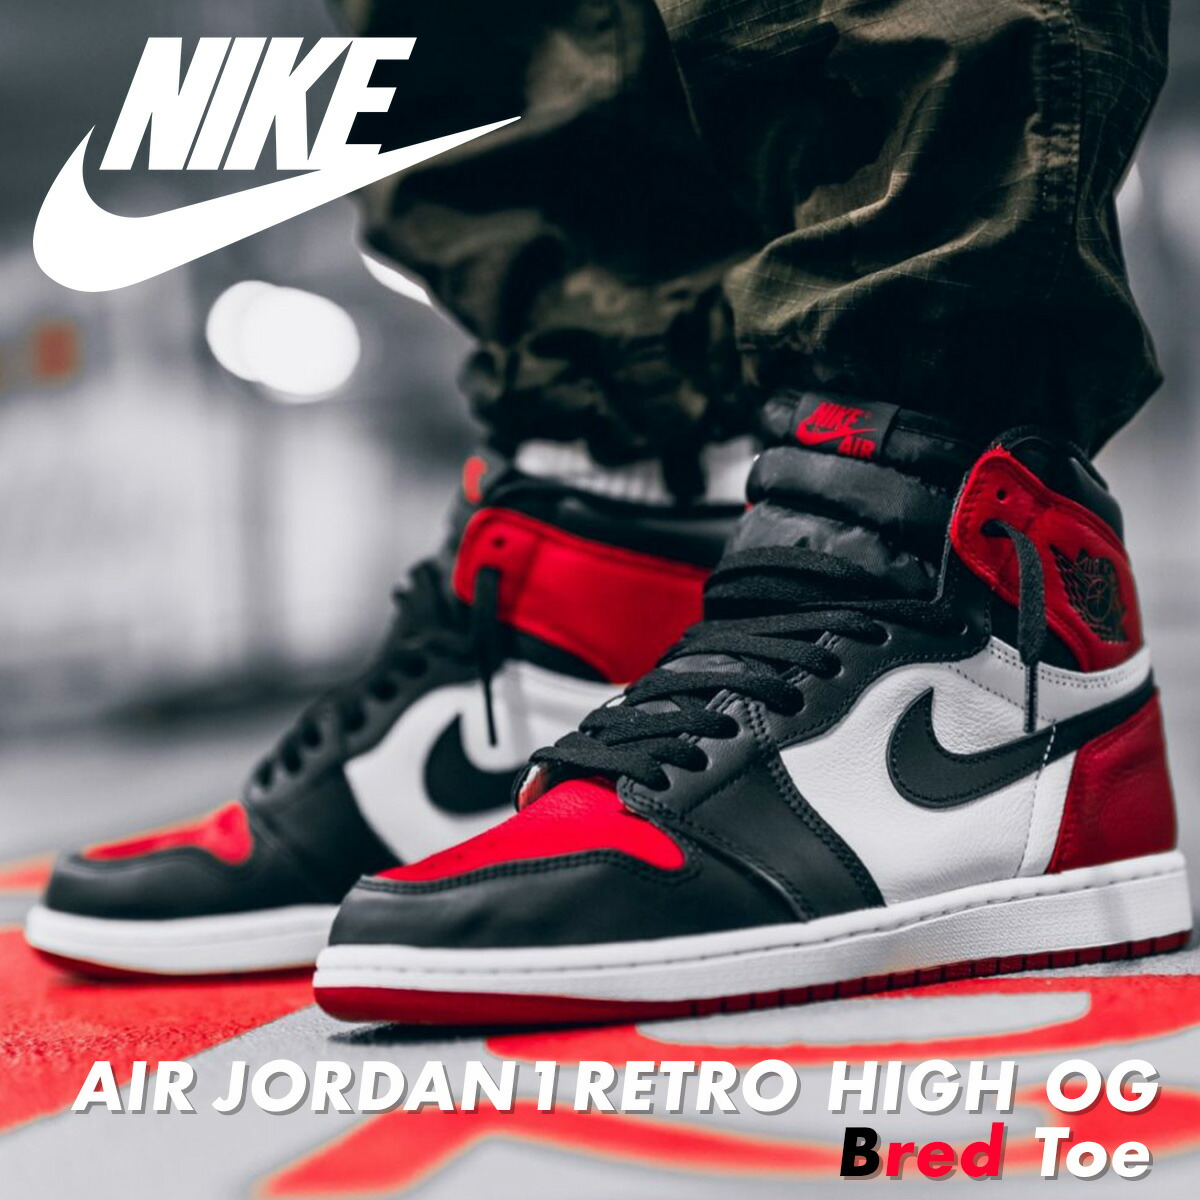 ff87ae240df20 ALLSPORTS  NIKE AIR JORDAN 1 RETRO HIGH OG BRED TOE Nike Air Jordan ...